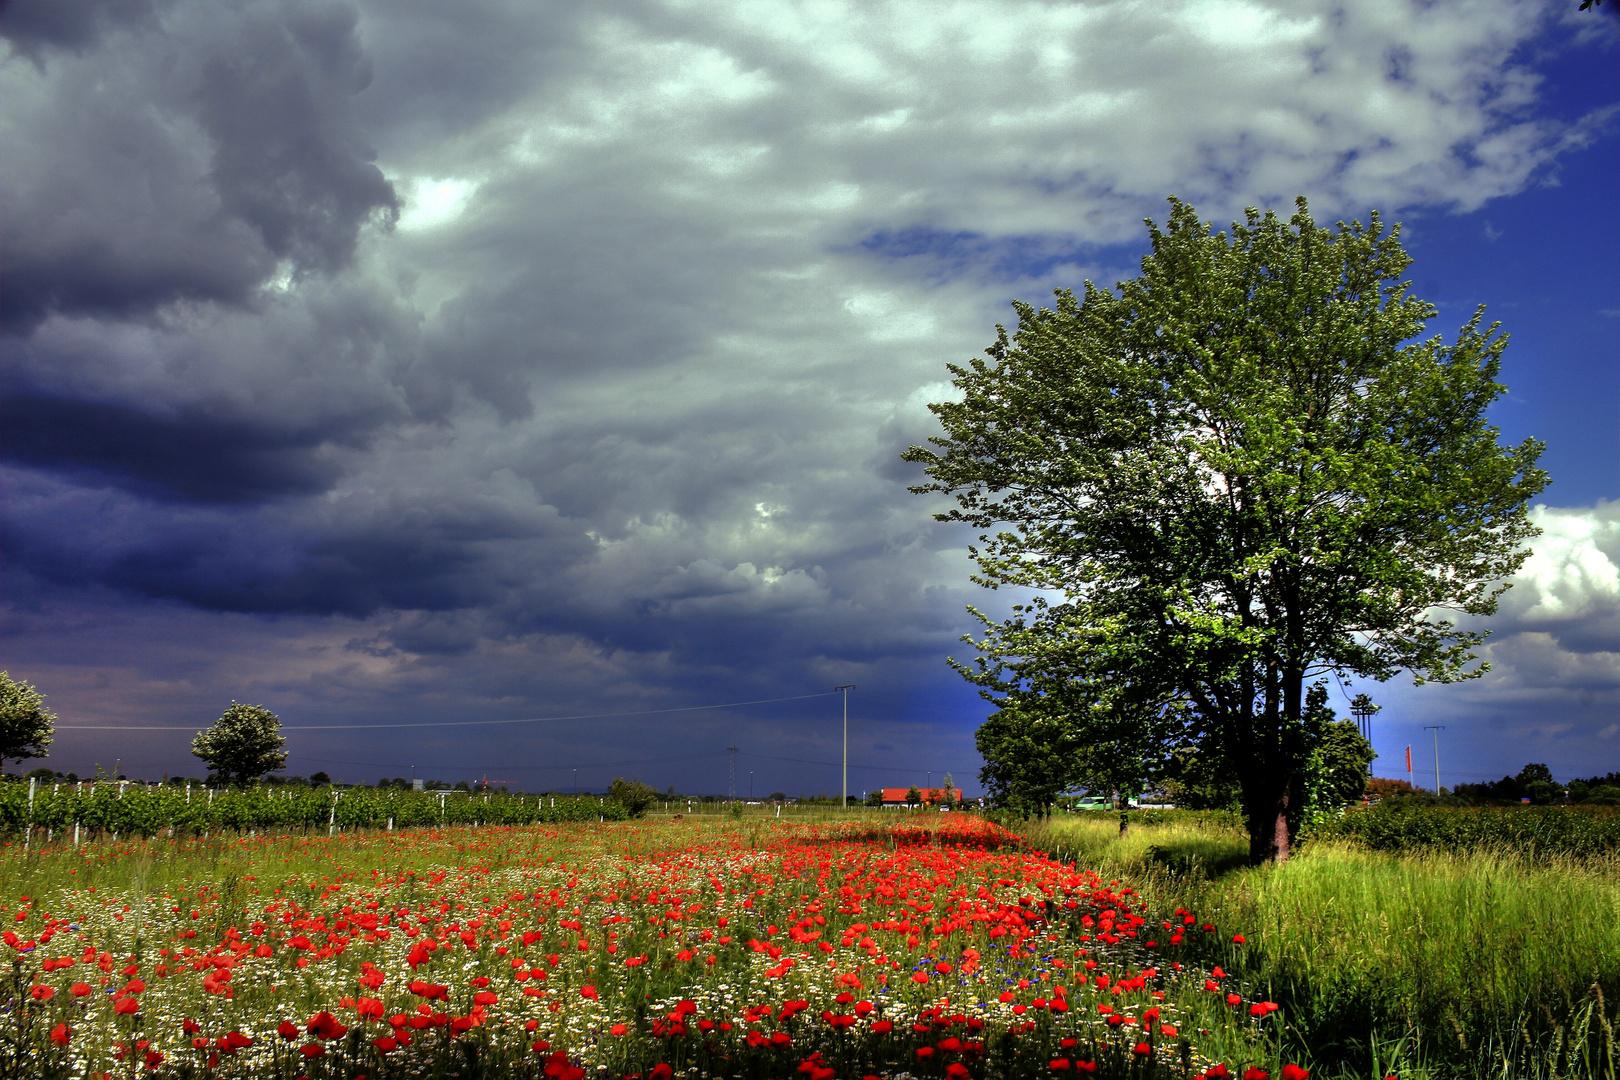 Dunkle Wolken überm Mohnfeld